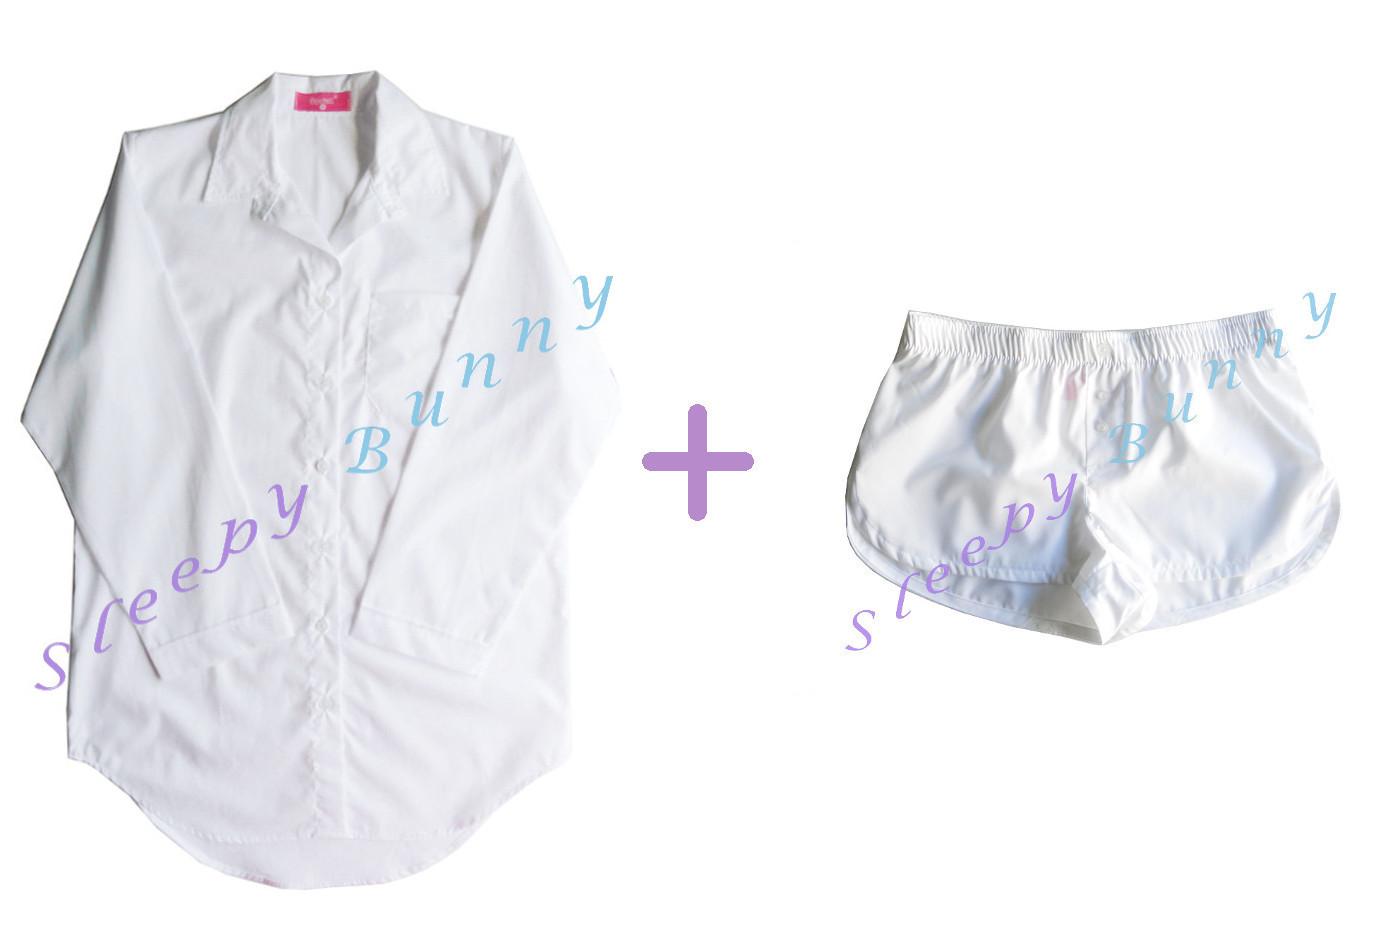 Promotion db5X set สีขาวออฟไวท์ไซส์ใหญ่ ชุดนอนเดรสเชิ้ต Size L + กางเกง boxer Size XL --> Pajamazz